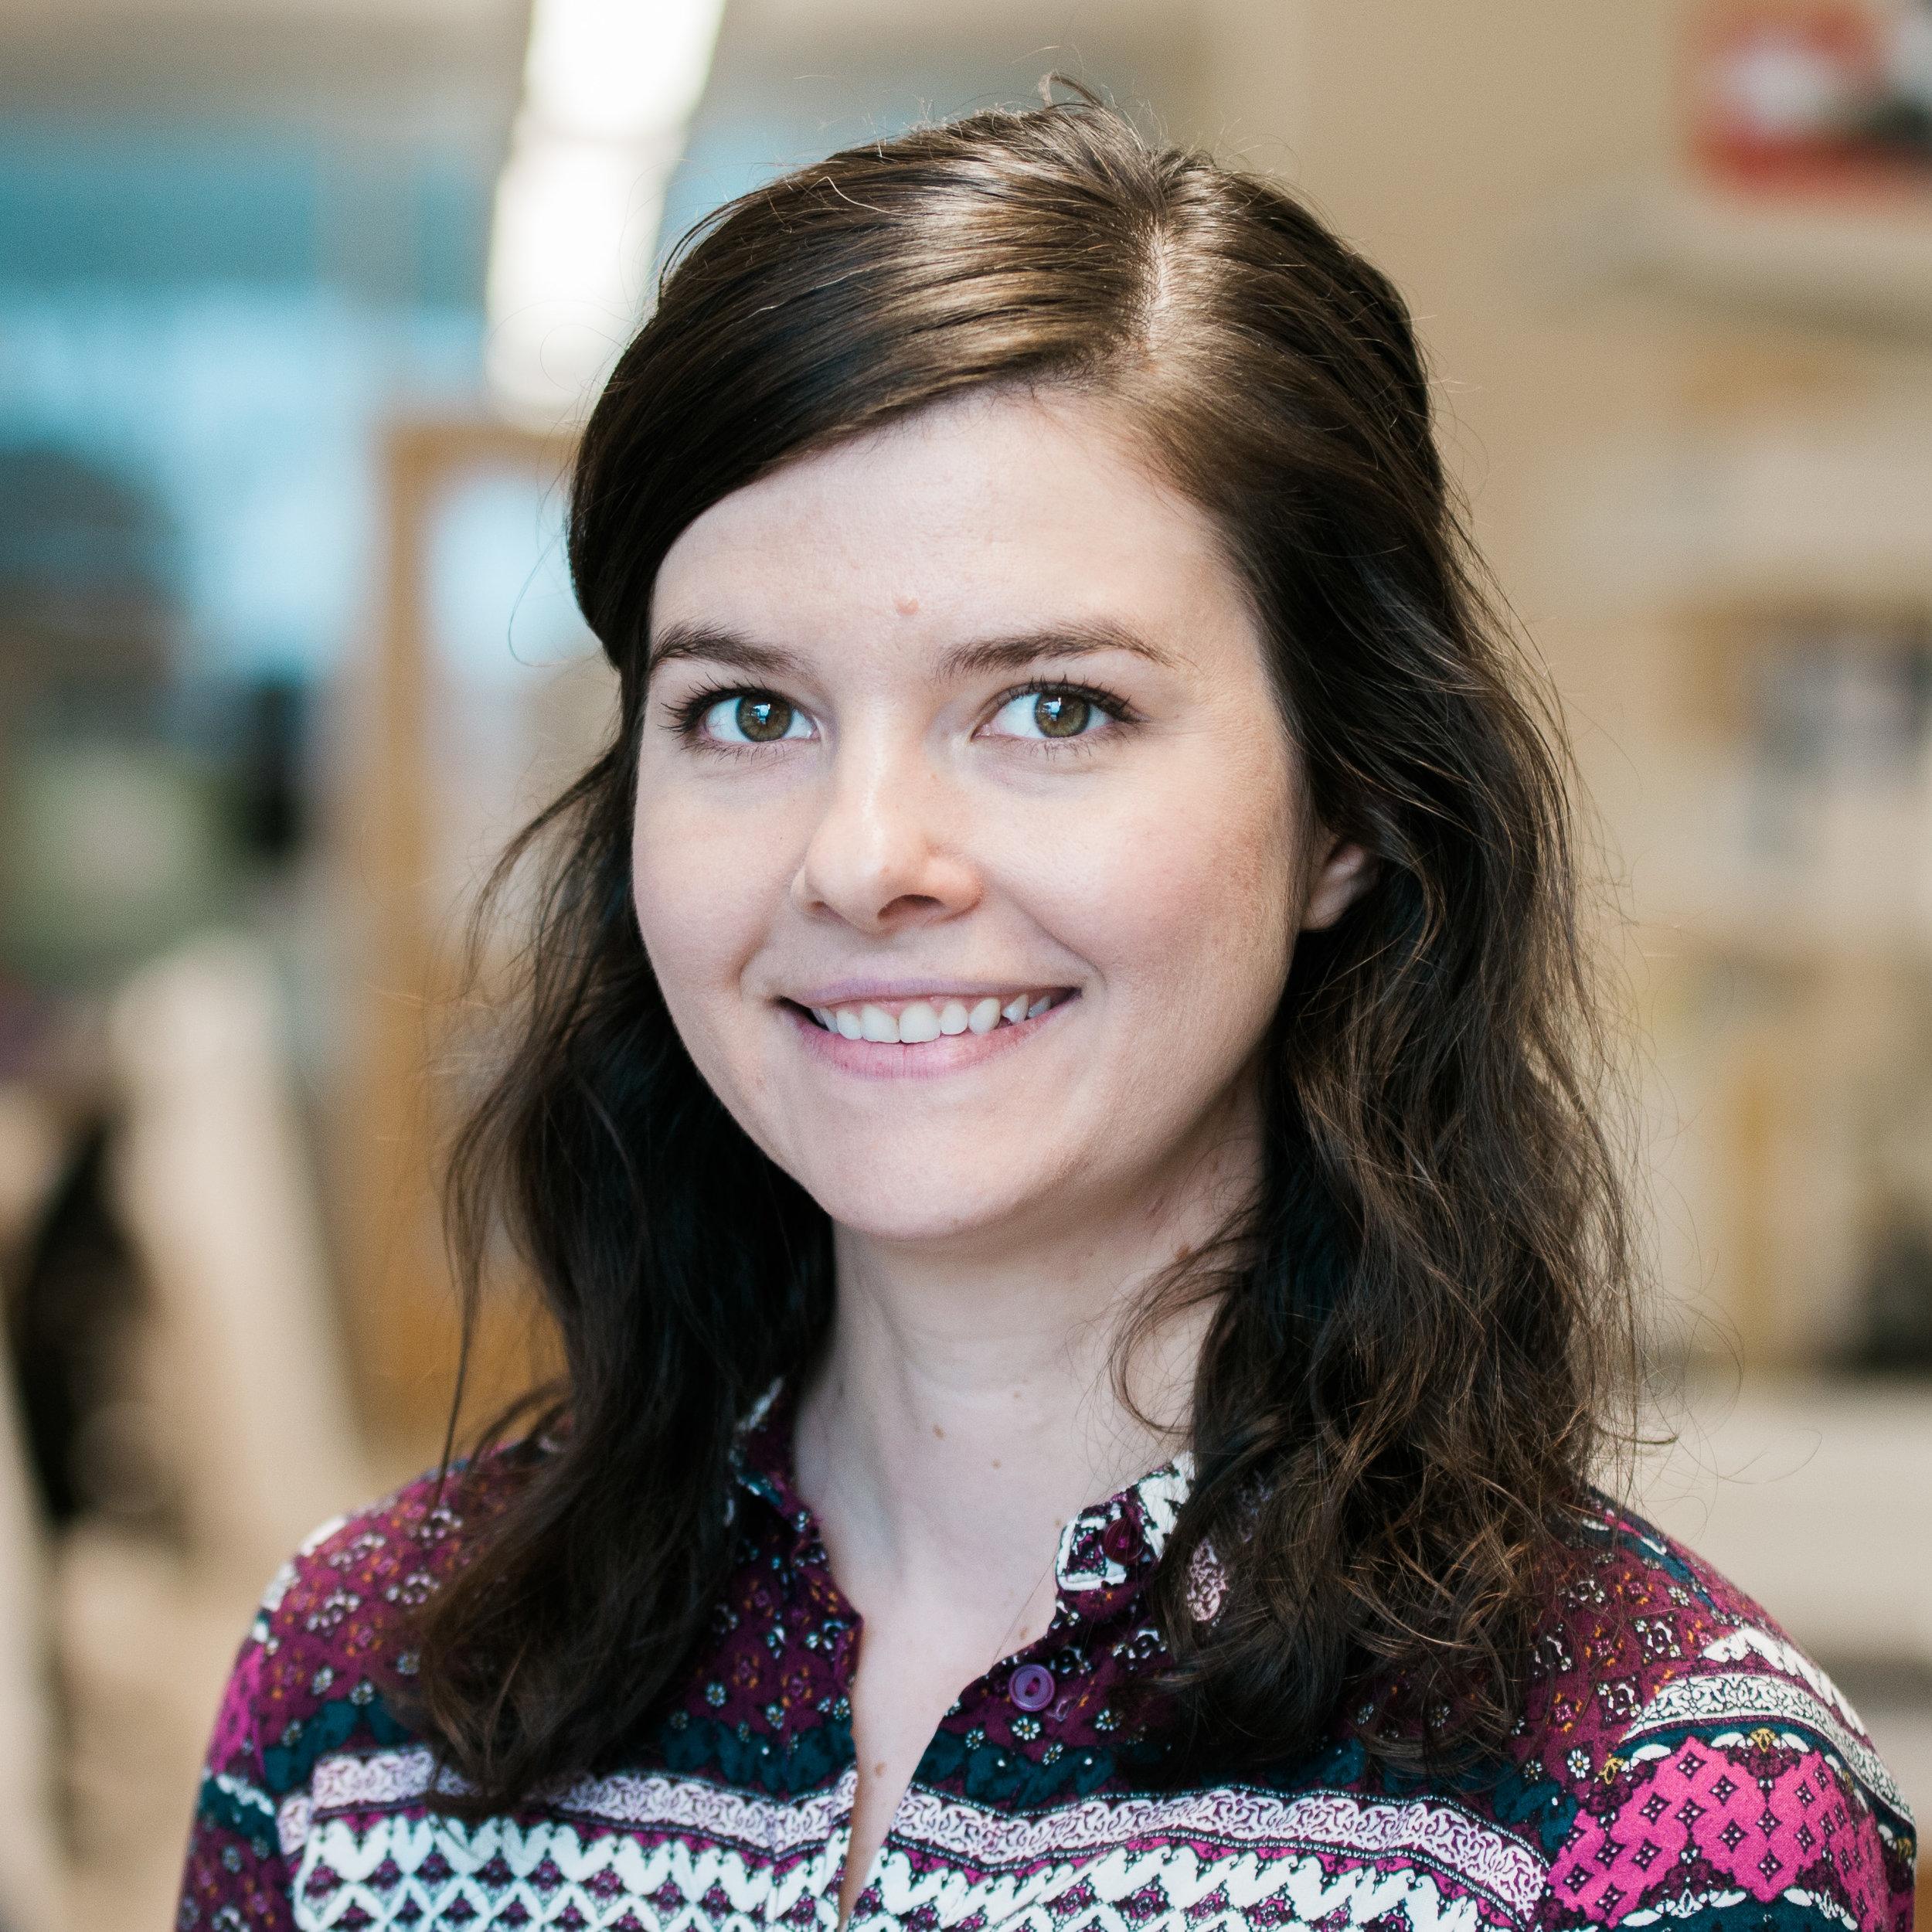 Miranda Wallace, PhD mjwallace [at] wustl.edu